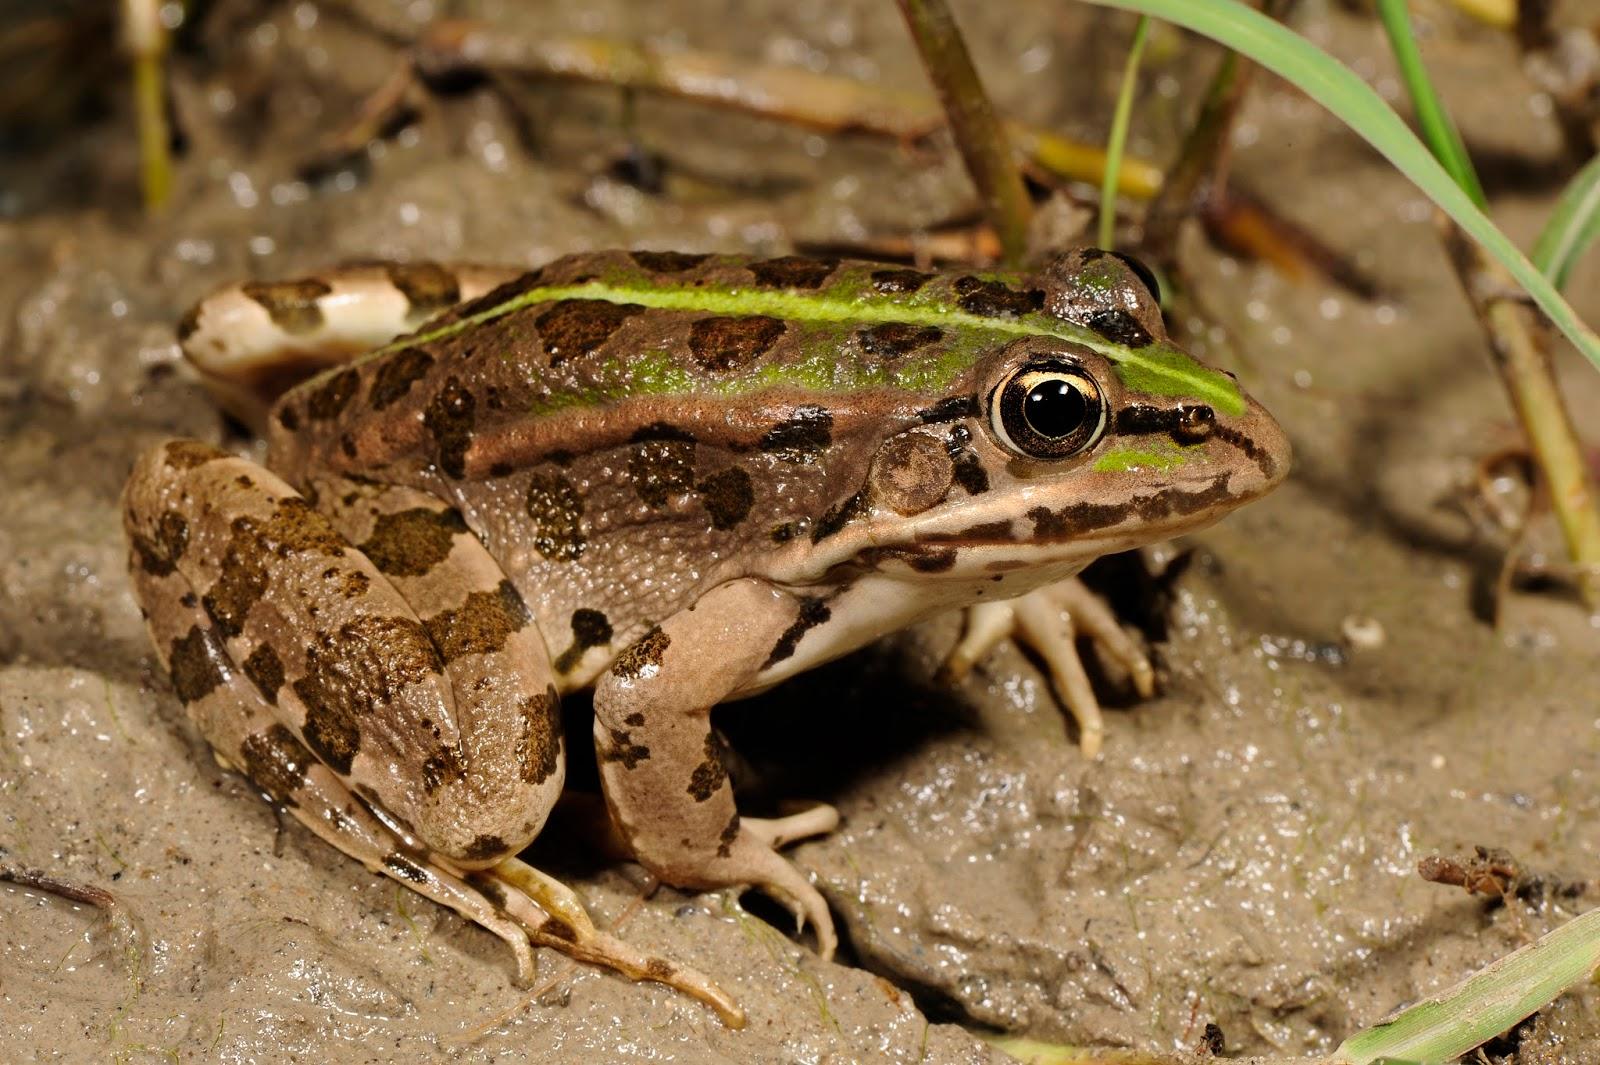 Amphibians: Benny Trapp Epirusfrosch Pelophylax epeiroticus